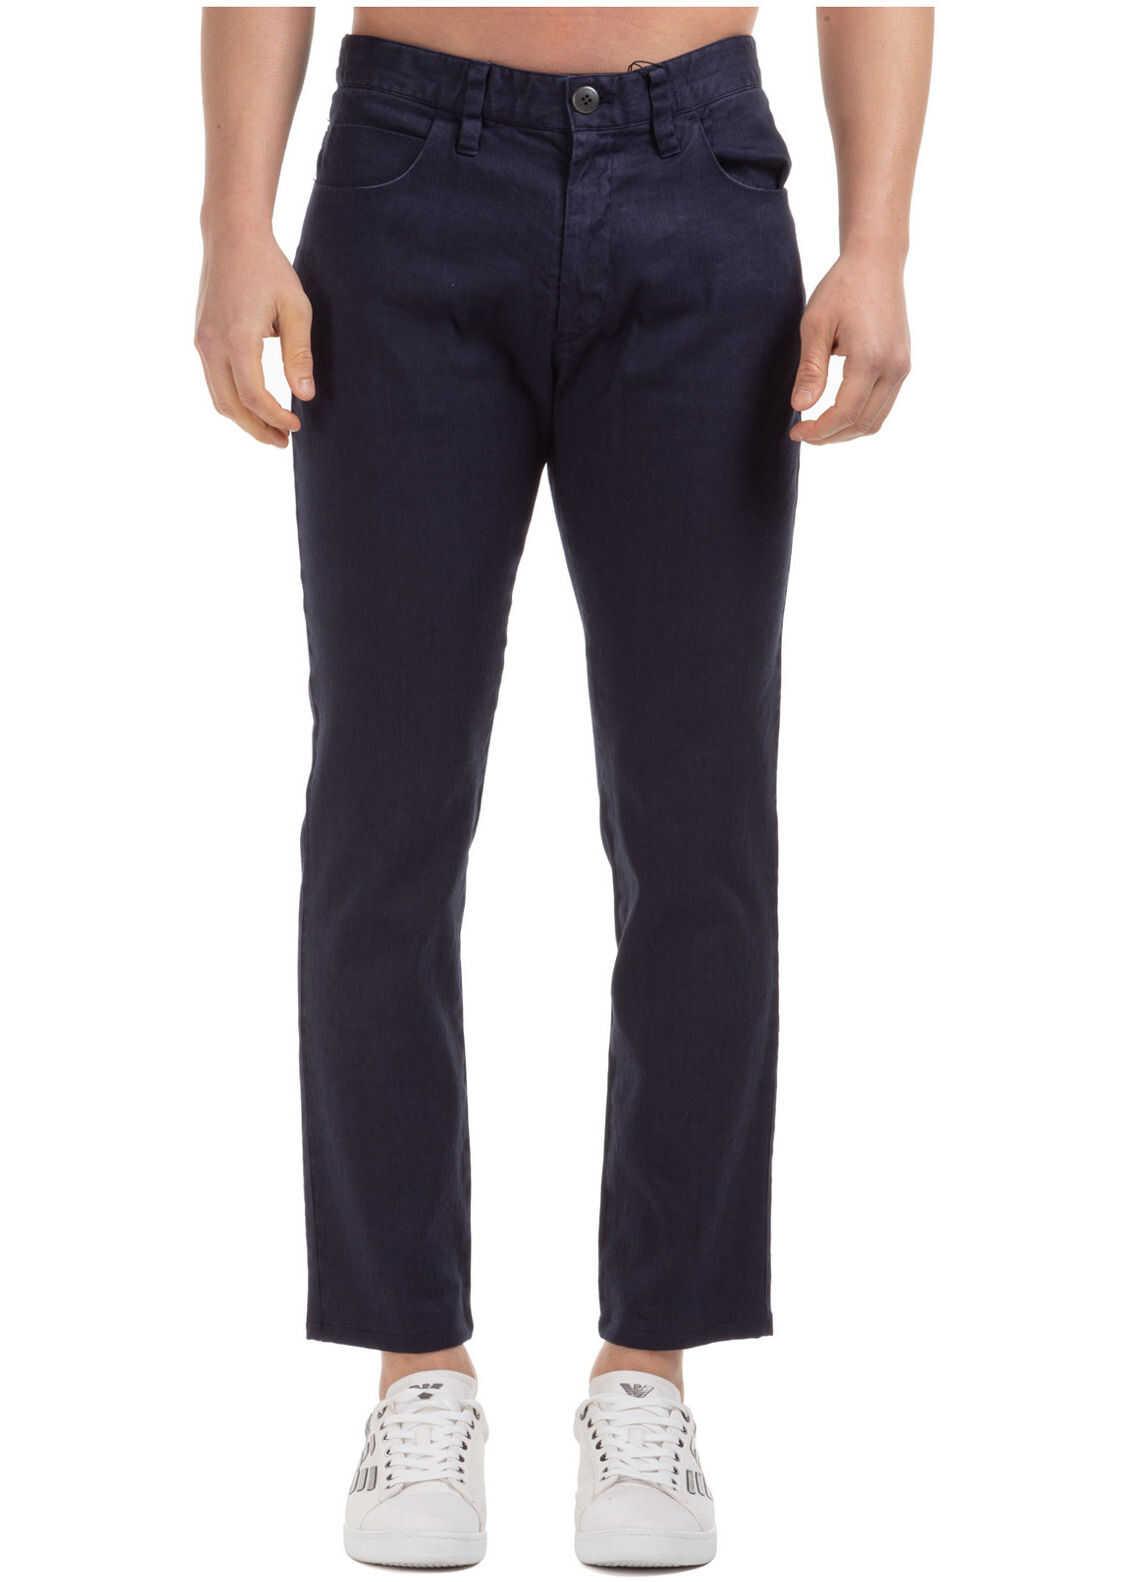 Emporio Armani Jeans Denim Blue